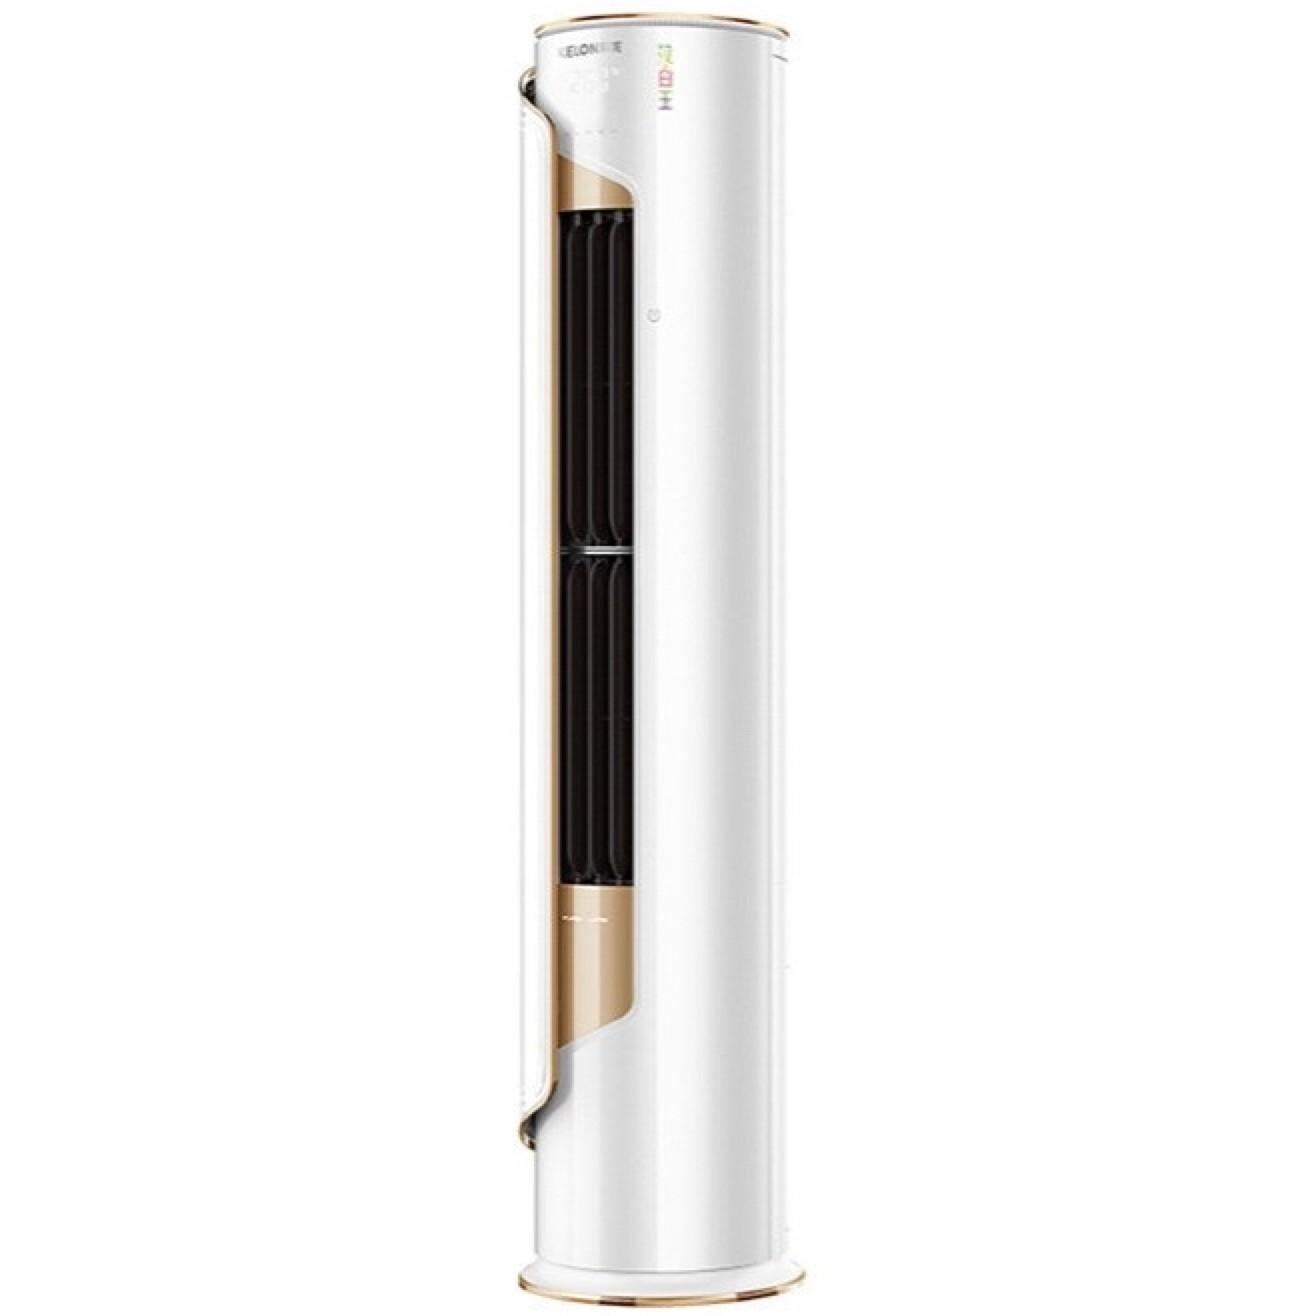 KELON 科龙 汉白玉系列 KFR-50LW/MQ1-X1 新一级能效 立柜式空调 2匹